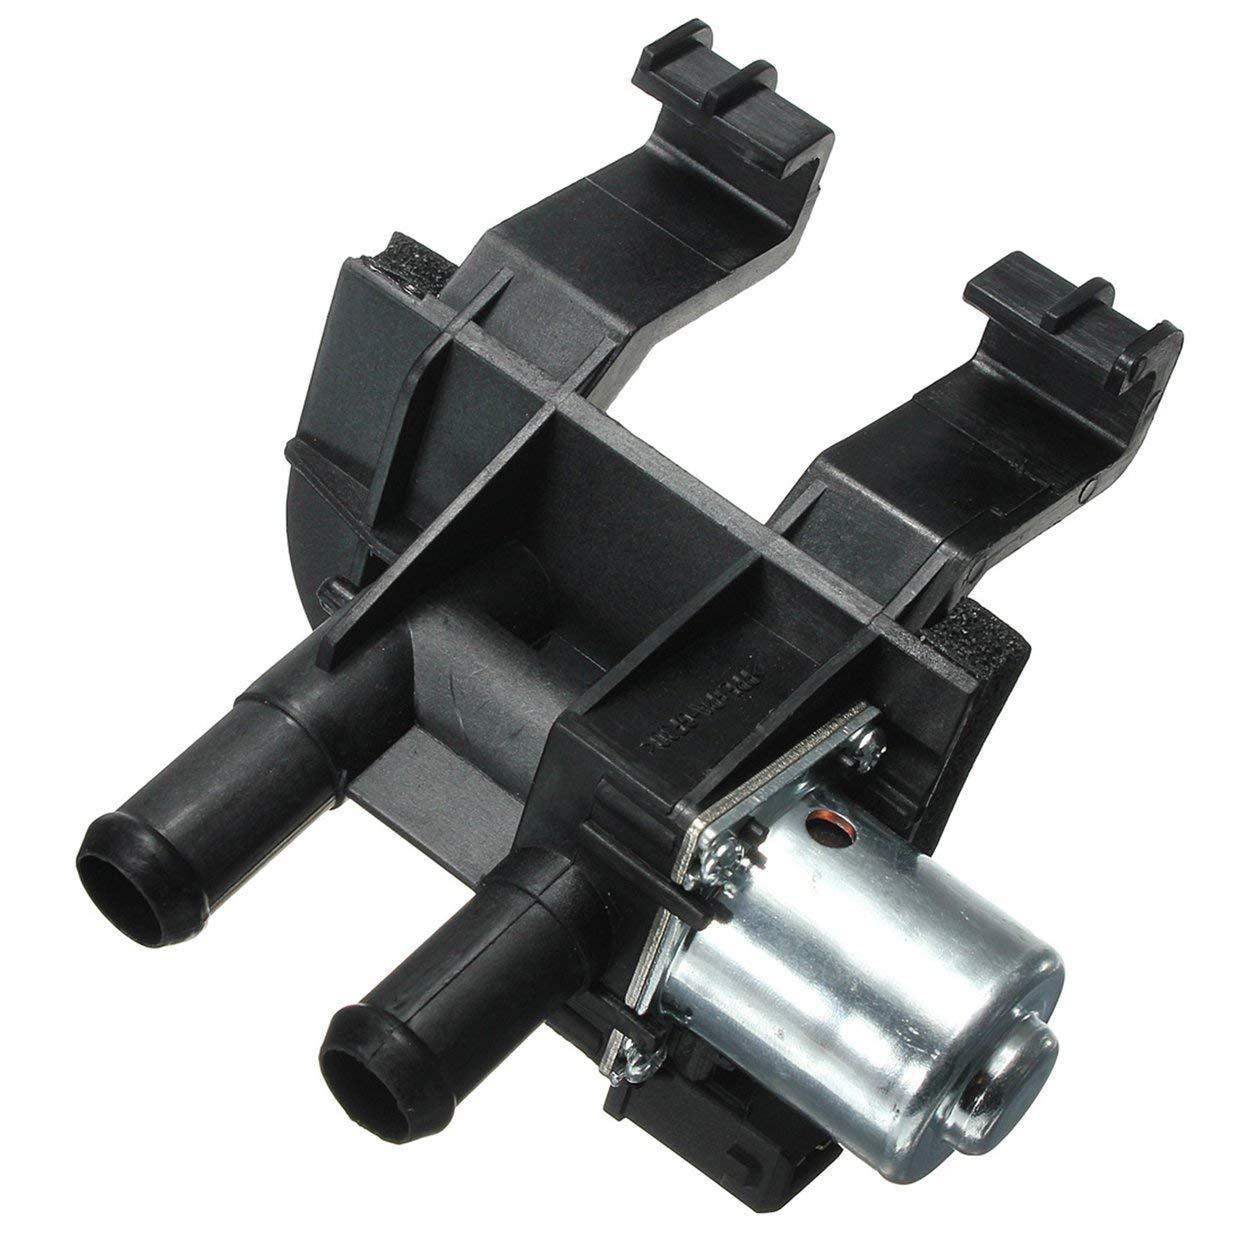 Vá lvula de control del calentador para Ford Fiesta KA Puma Street Transit Mazda 121 LoveOlvidoE